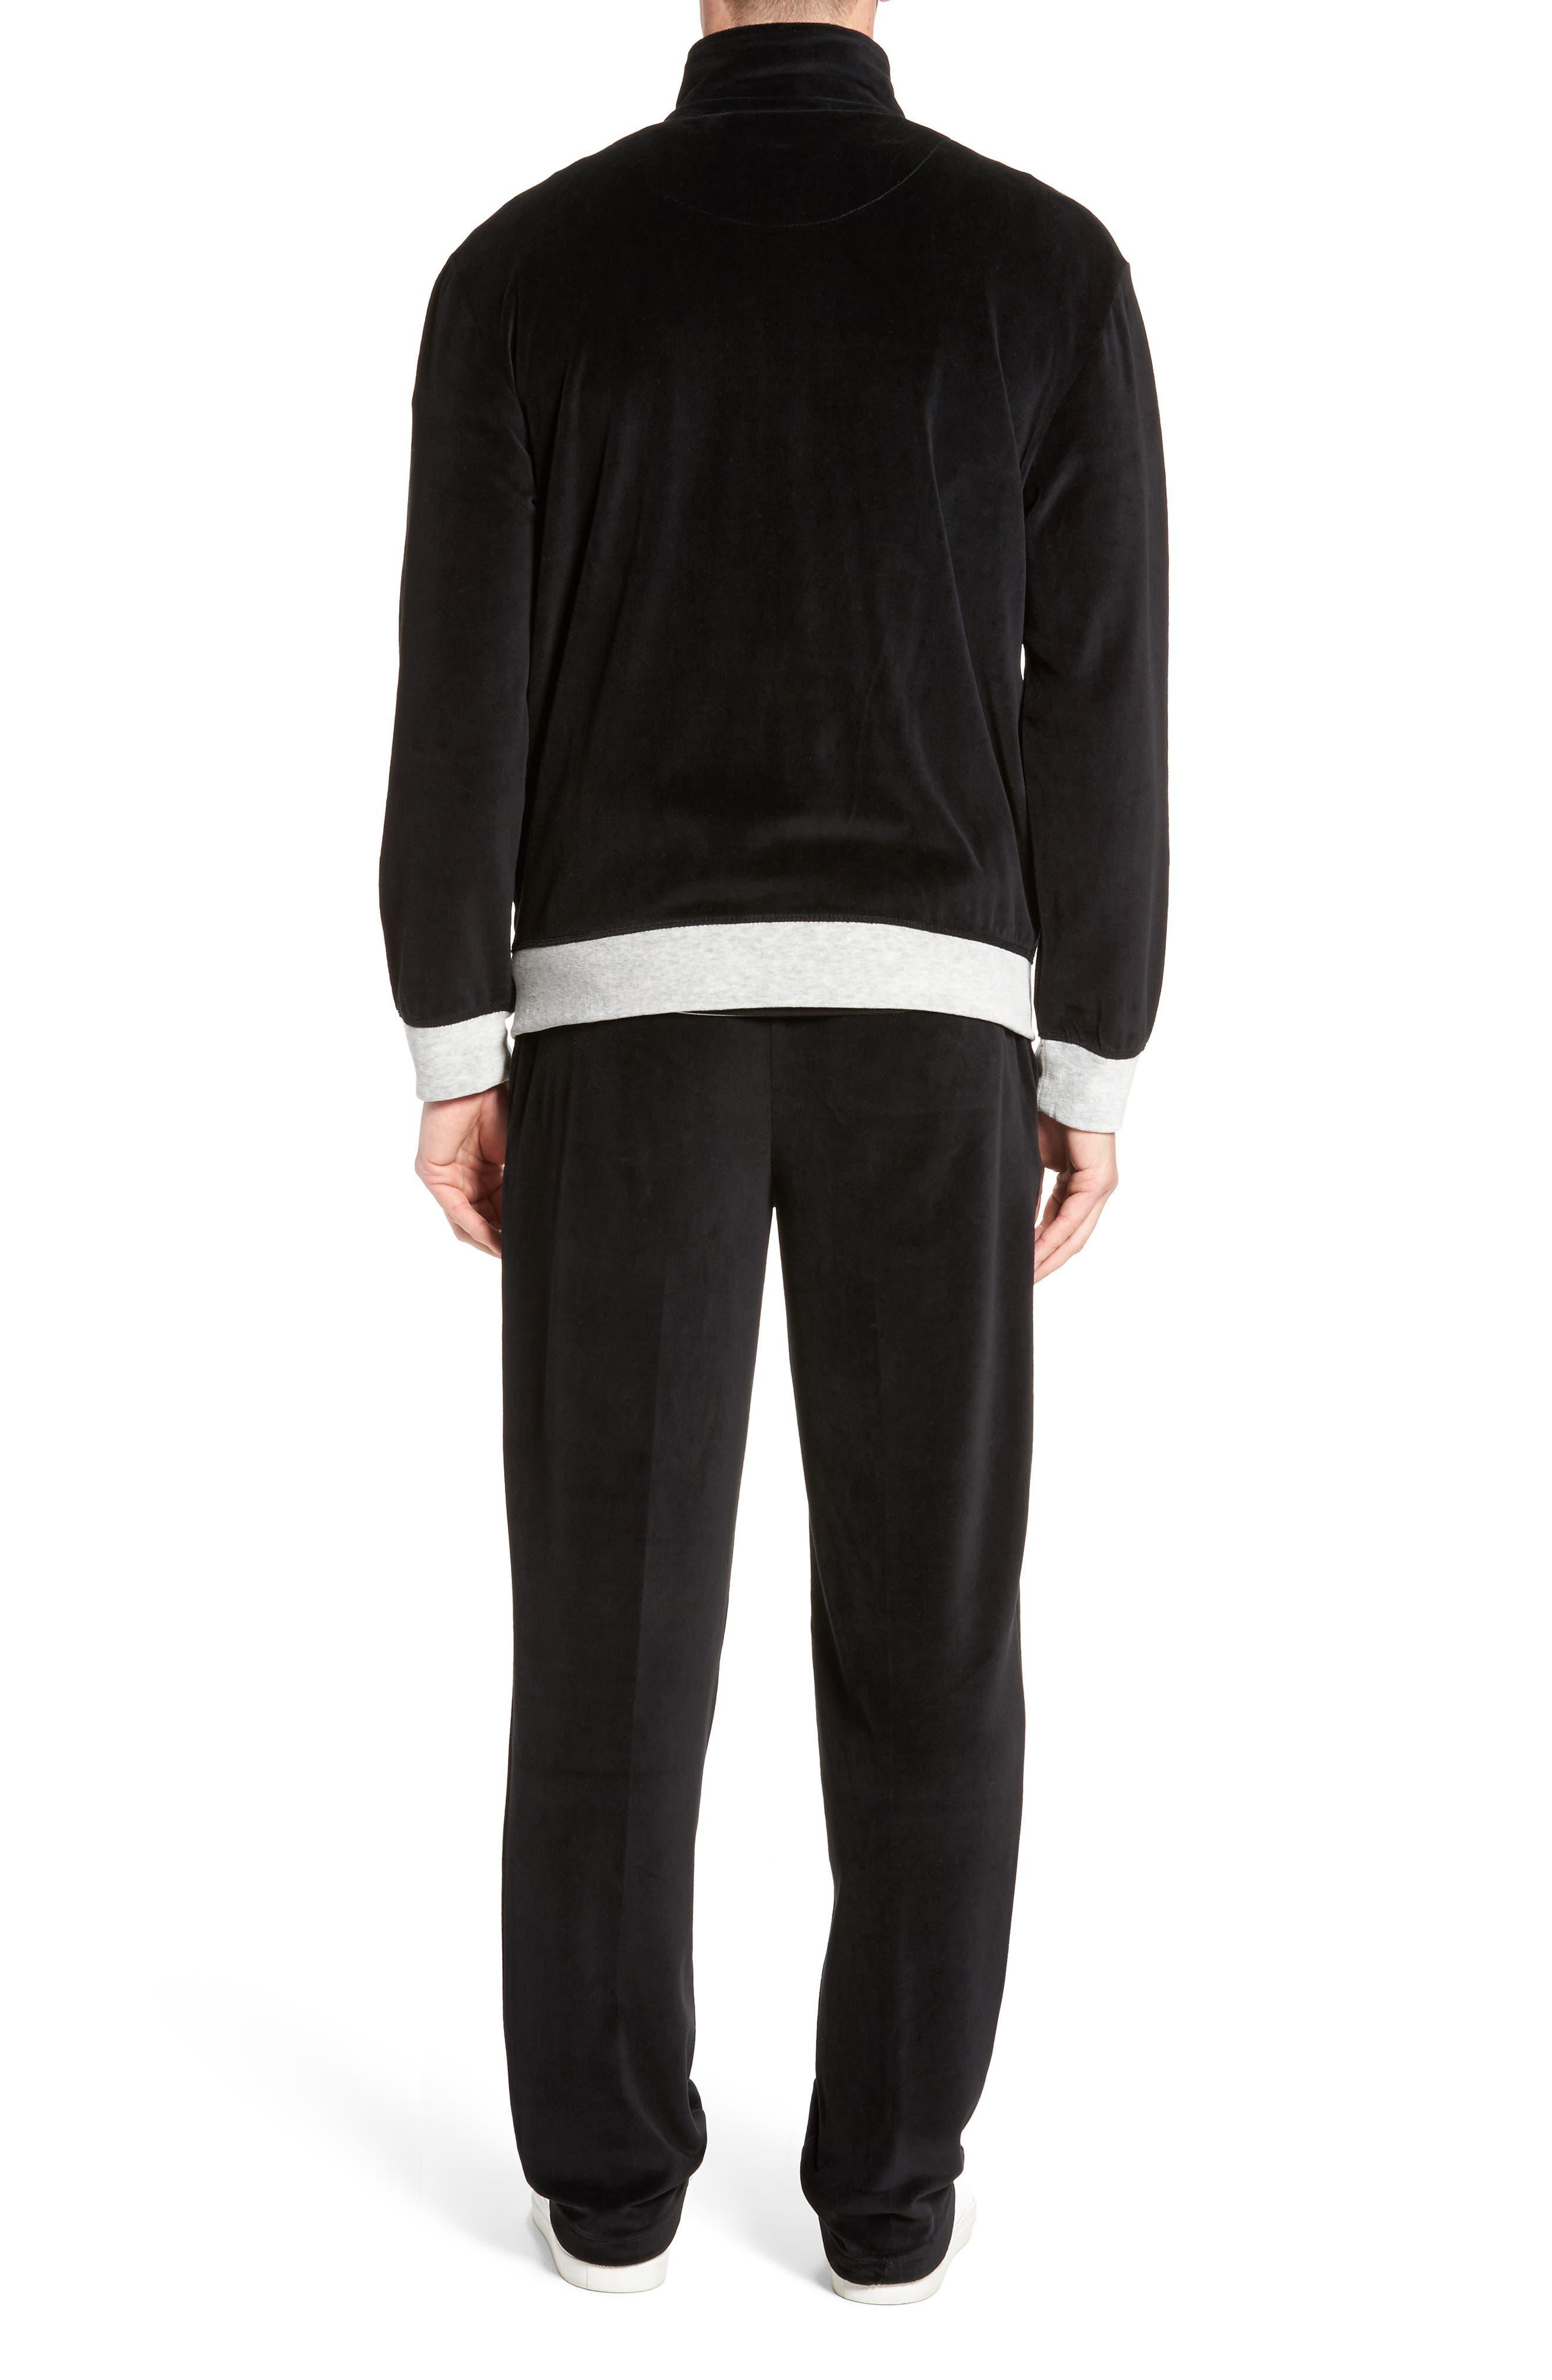 Strathcona Velour Warm-Up Suit,                             Alternate thumbnail 2, color,                             001